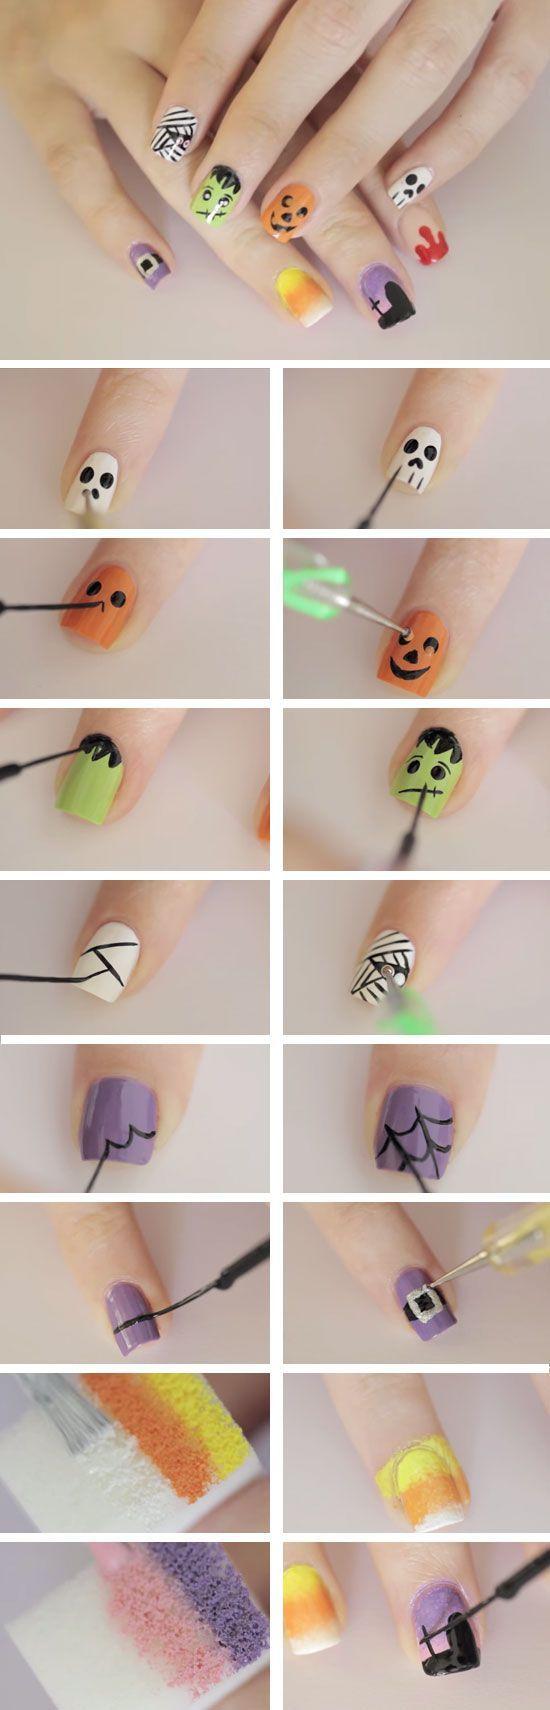 Nail Art Ideas Cheap Nail Art Supplies Uk Pictures Of Nail Art